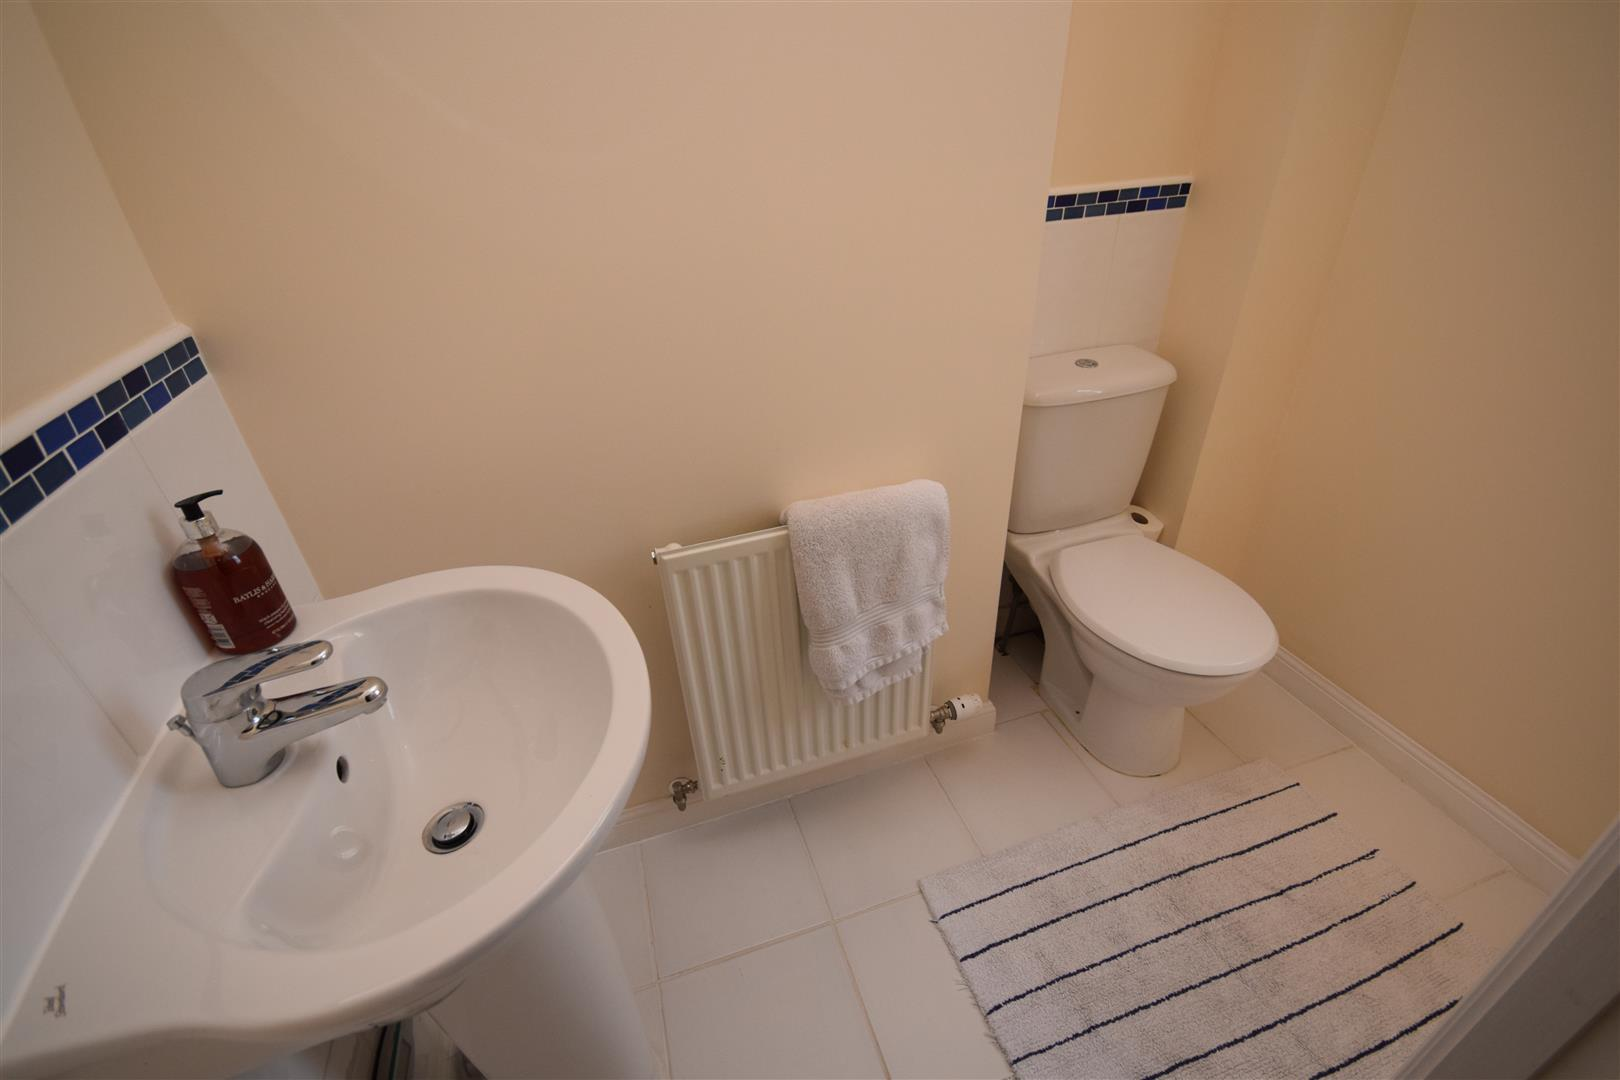 4, Bertram Dickson Place, Errol, Perth, Perthshire, PH2 7UY, UK